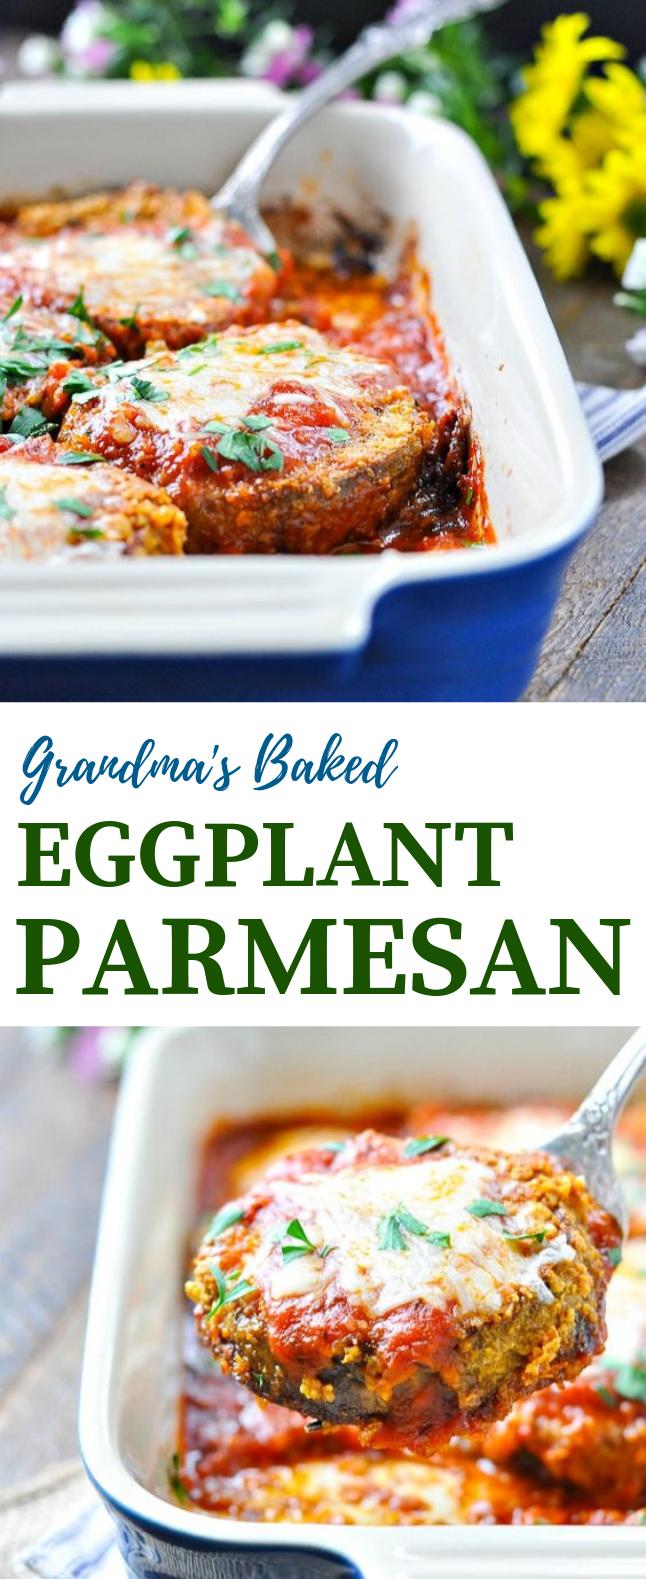 GRANDMA'S BAKED EGGPLANT PARMESAN #Parmesan #Vegetarian